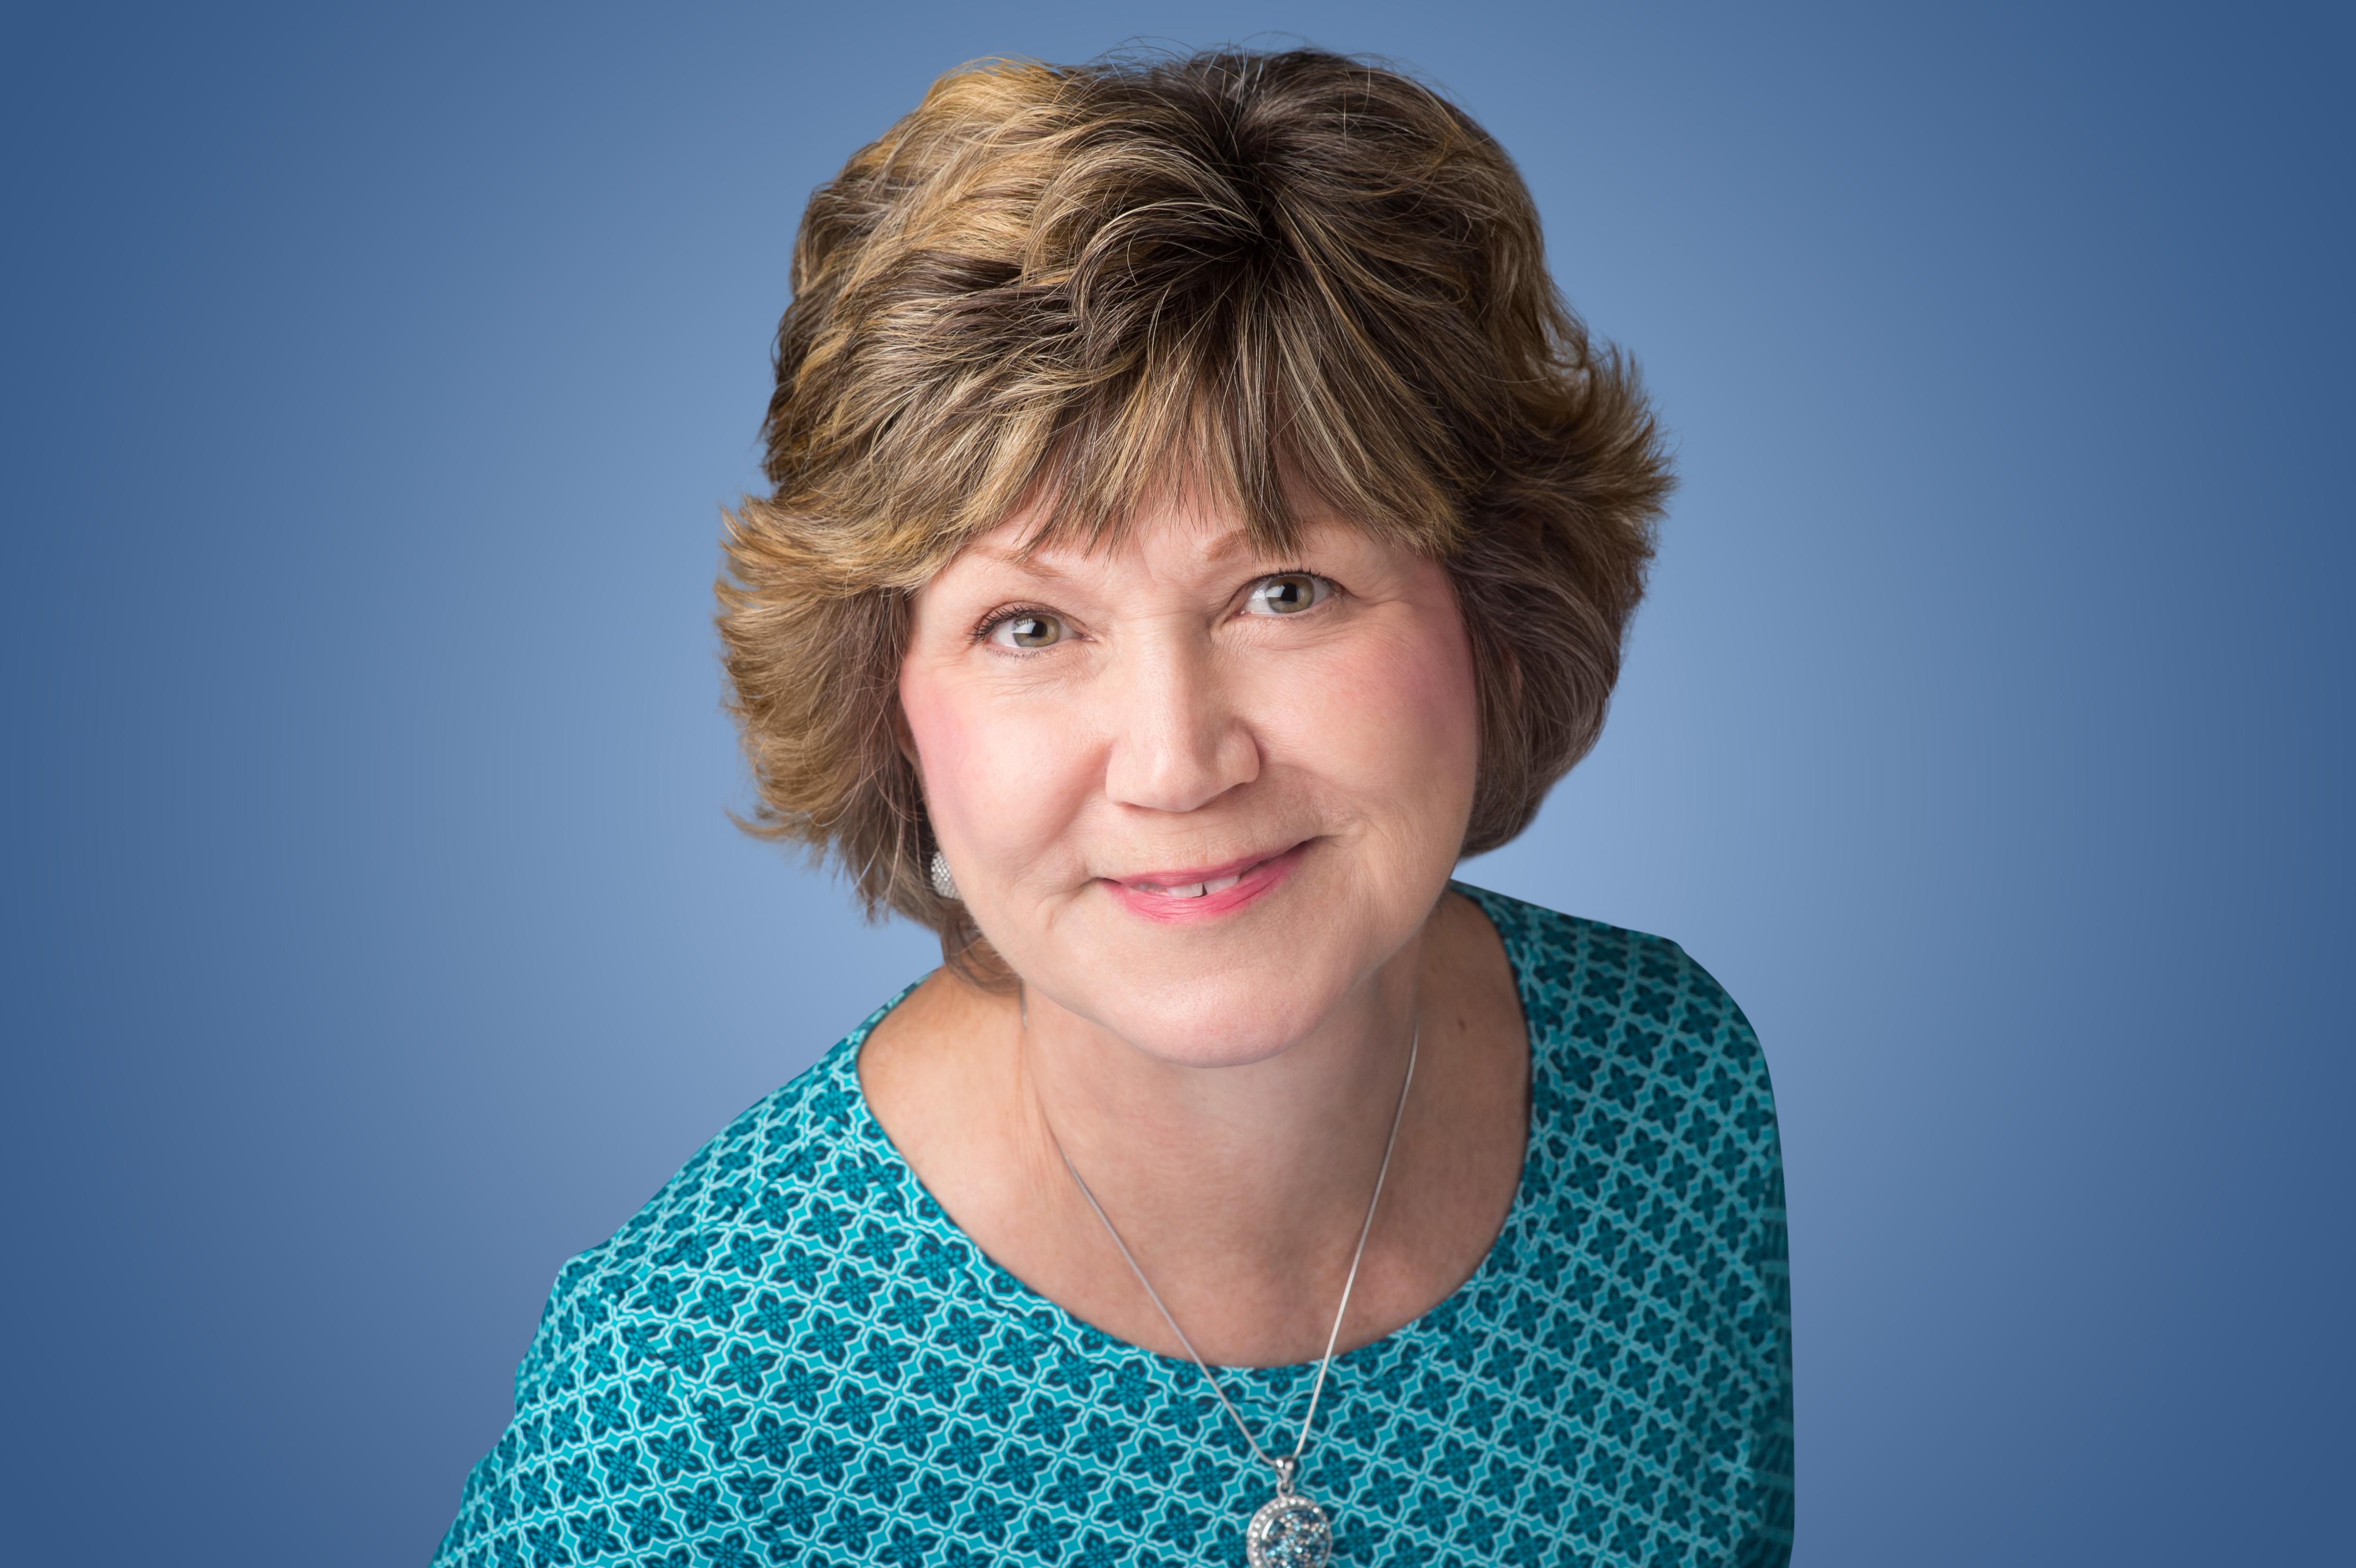 Barbara Inman Beck